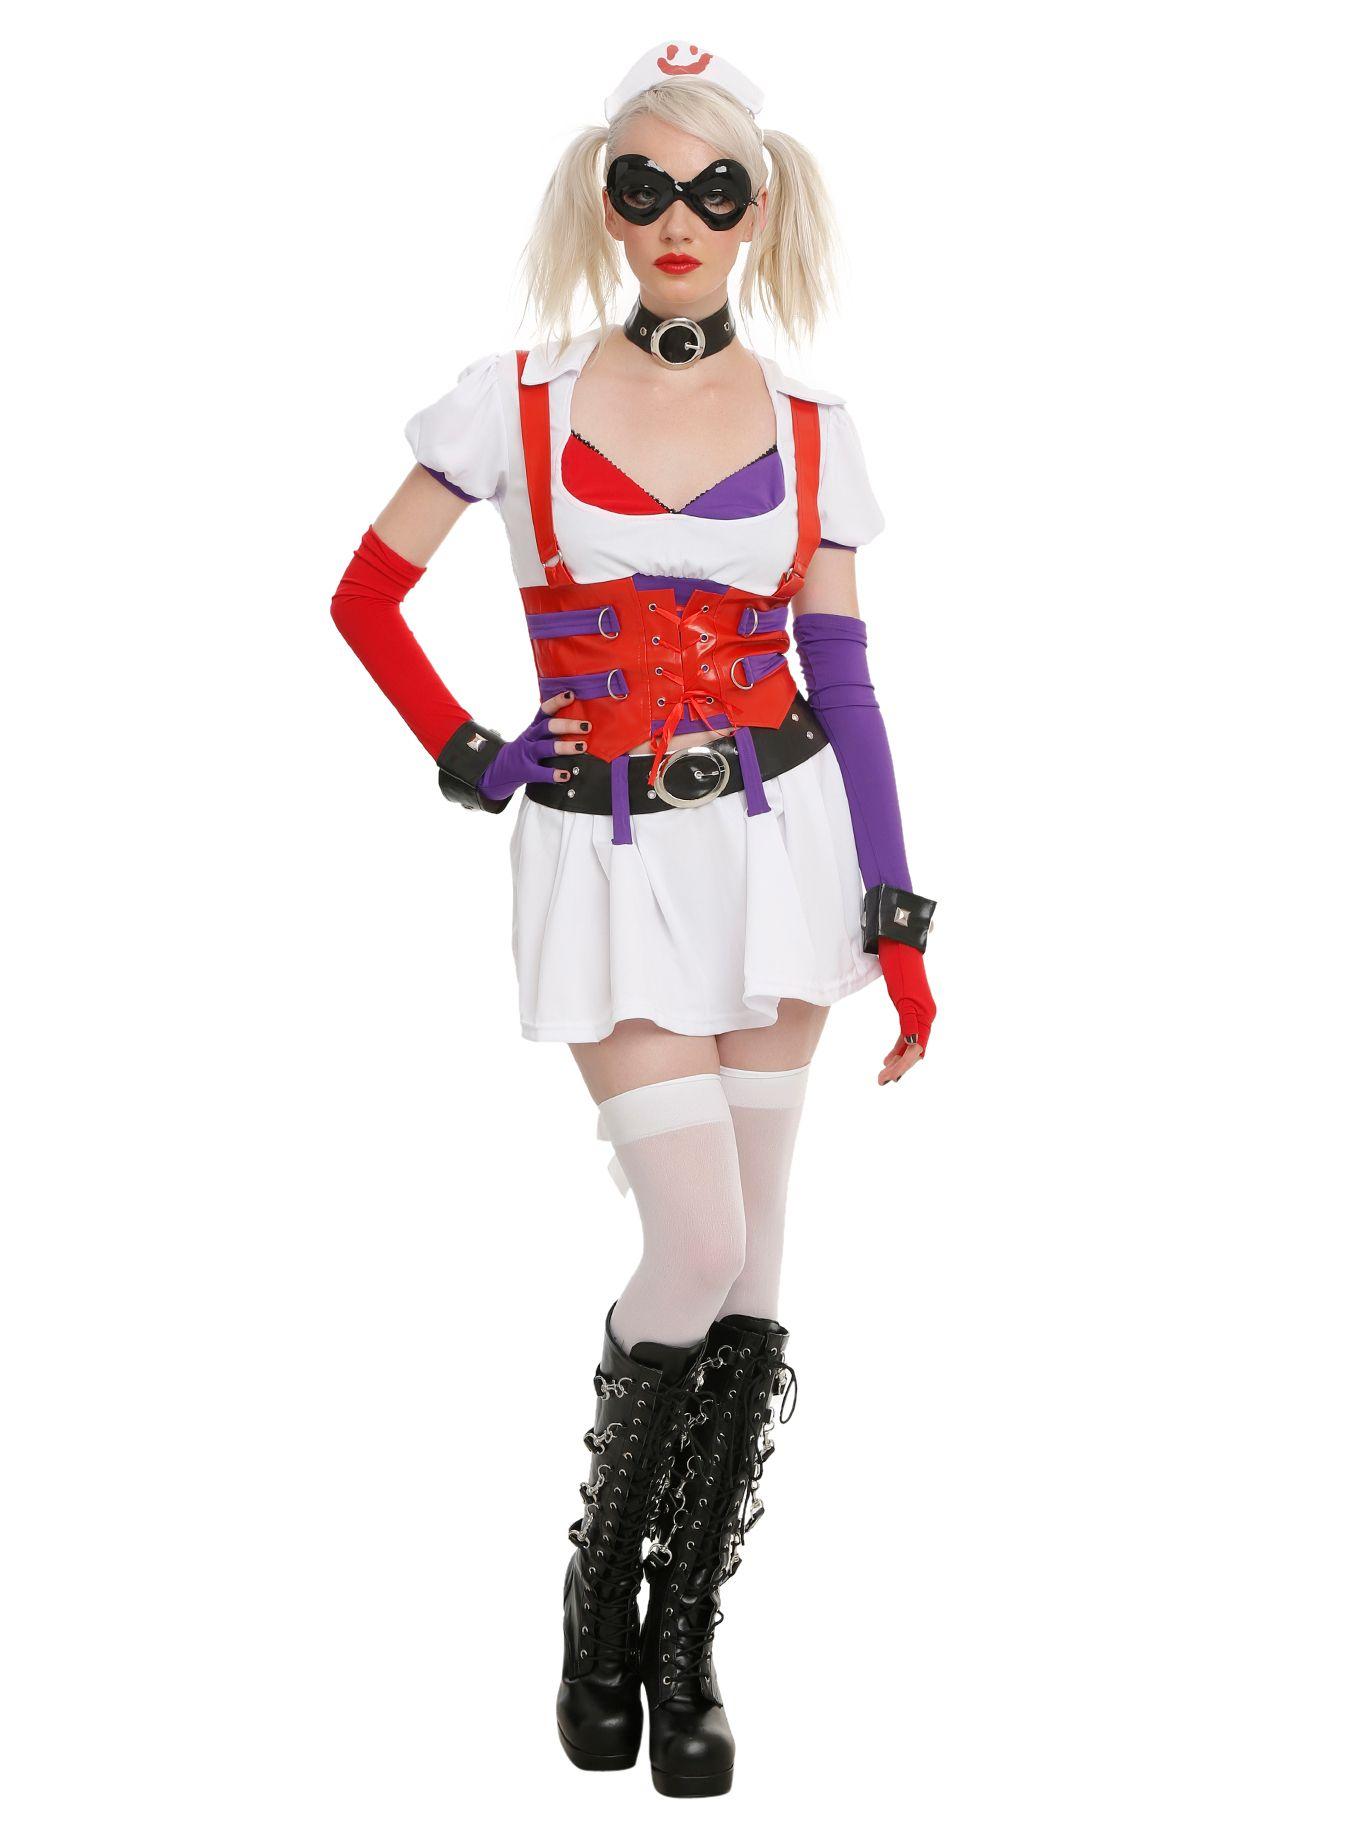 DC Comics Harley Quinn Eye Mask and Headpiece Costume Kit